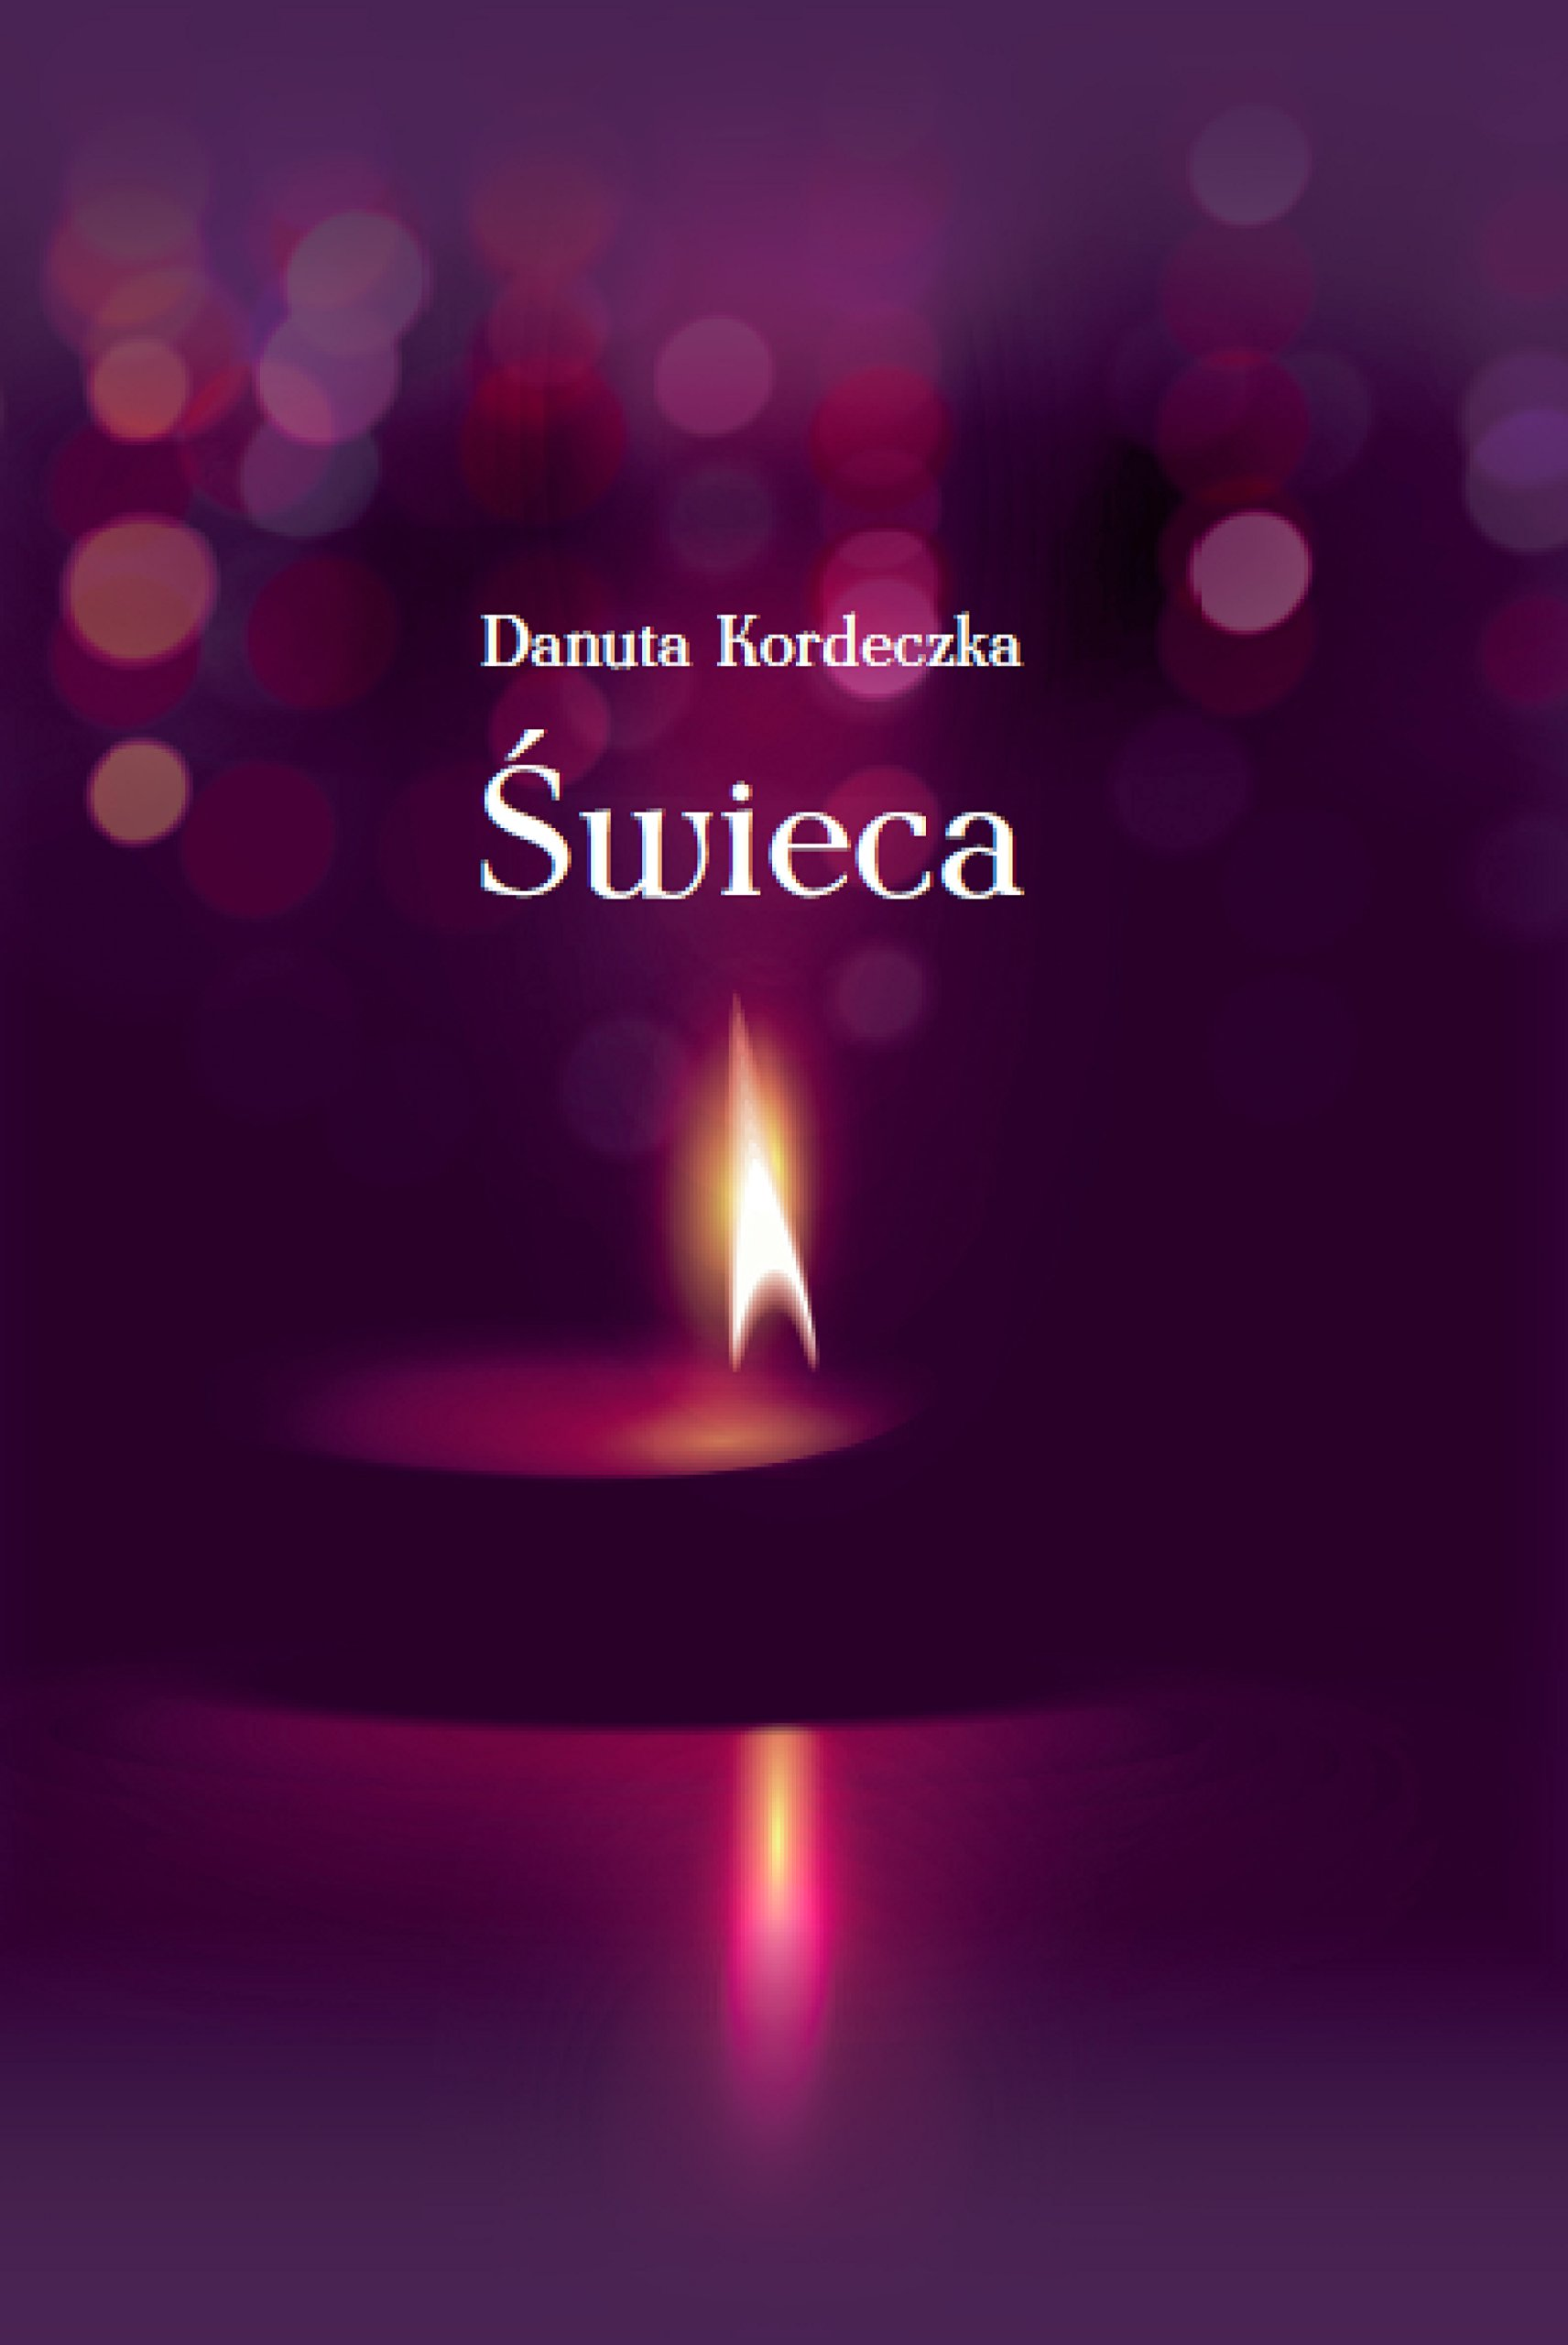 Swieca Amazoncouk Danuta Kordeczka 9788380115828 Books